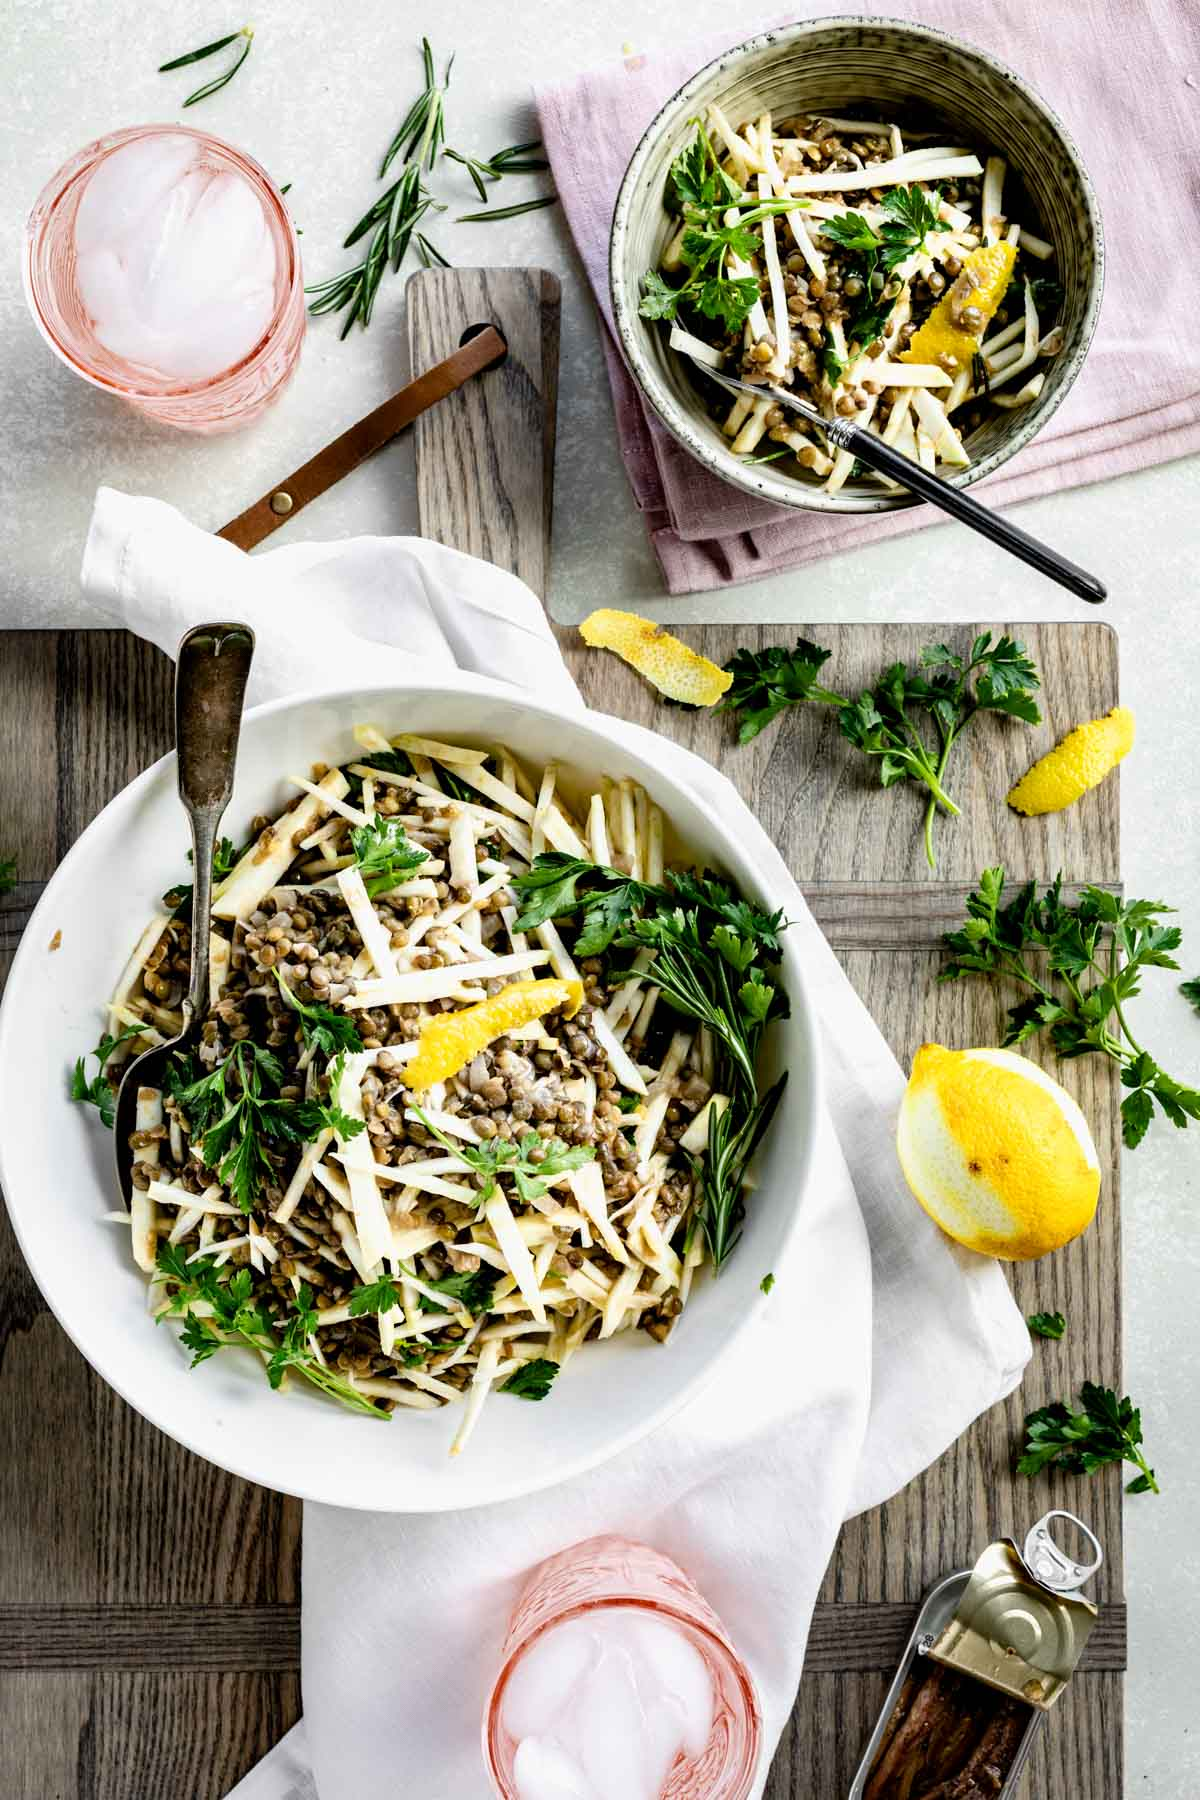 lentil salad with lemon and parsley